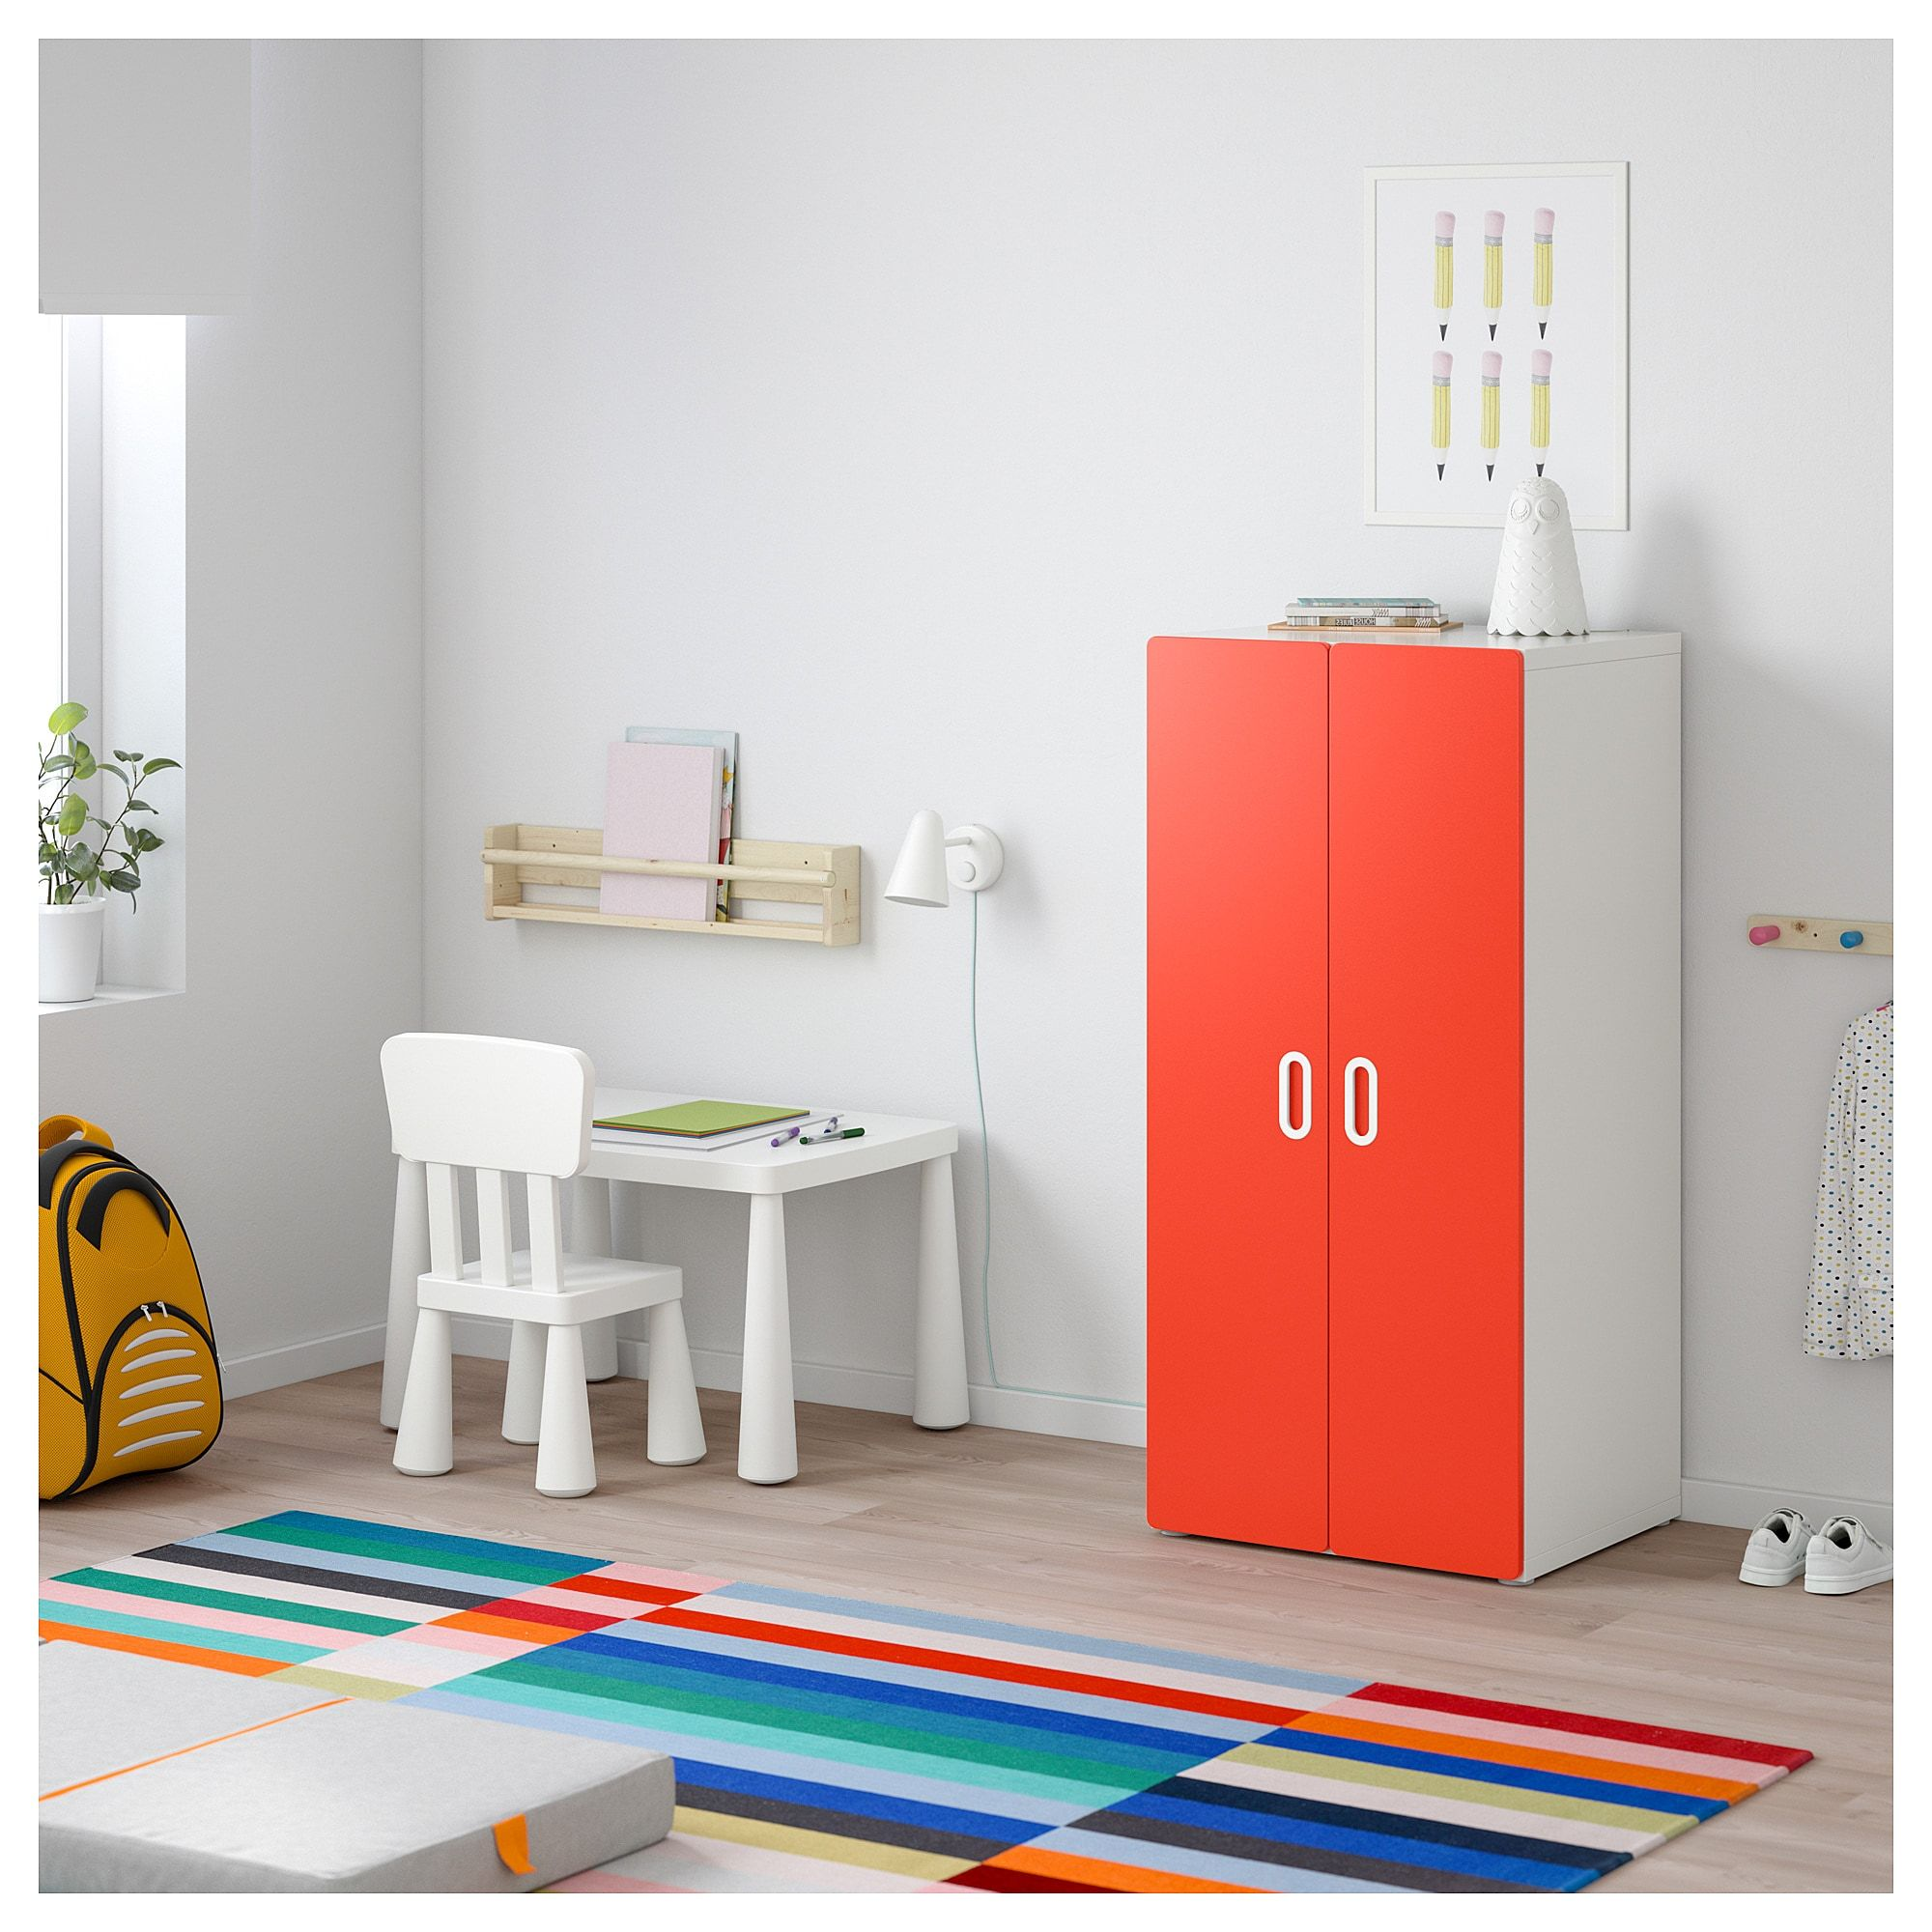 Stuva Fritids Kleiderschrank Weiss Rot In 2019 Products